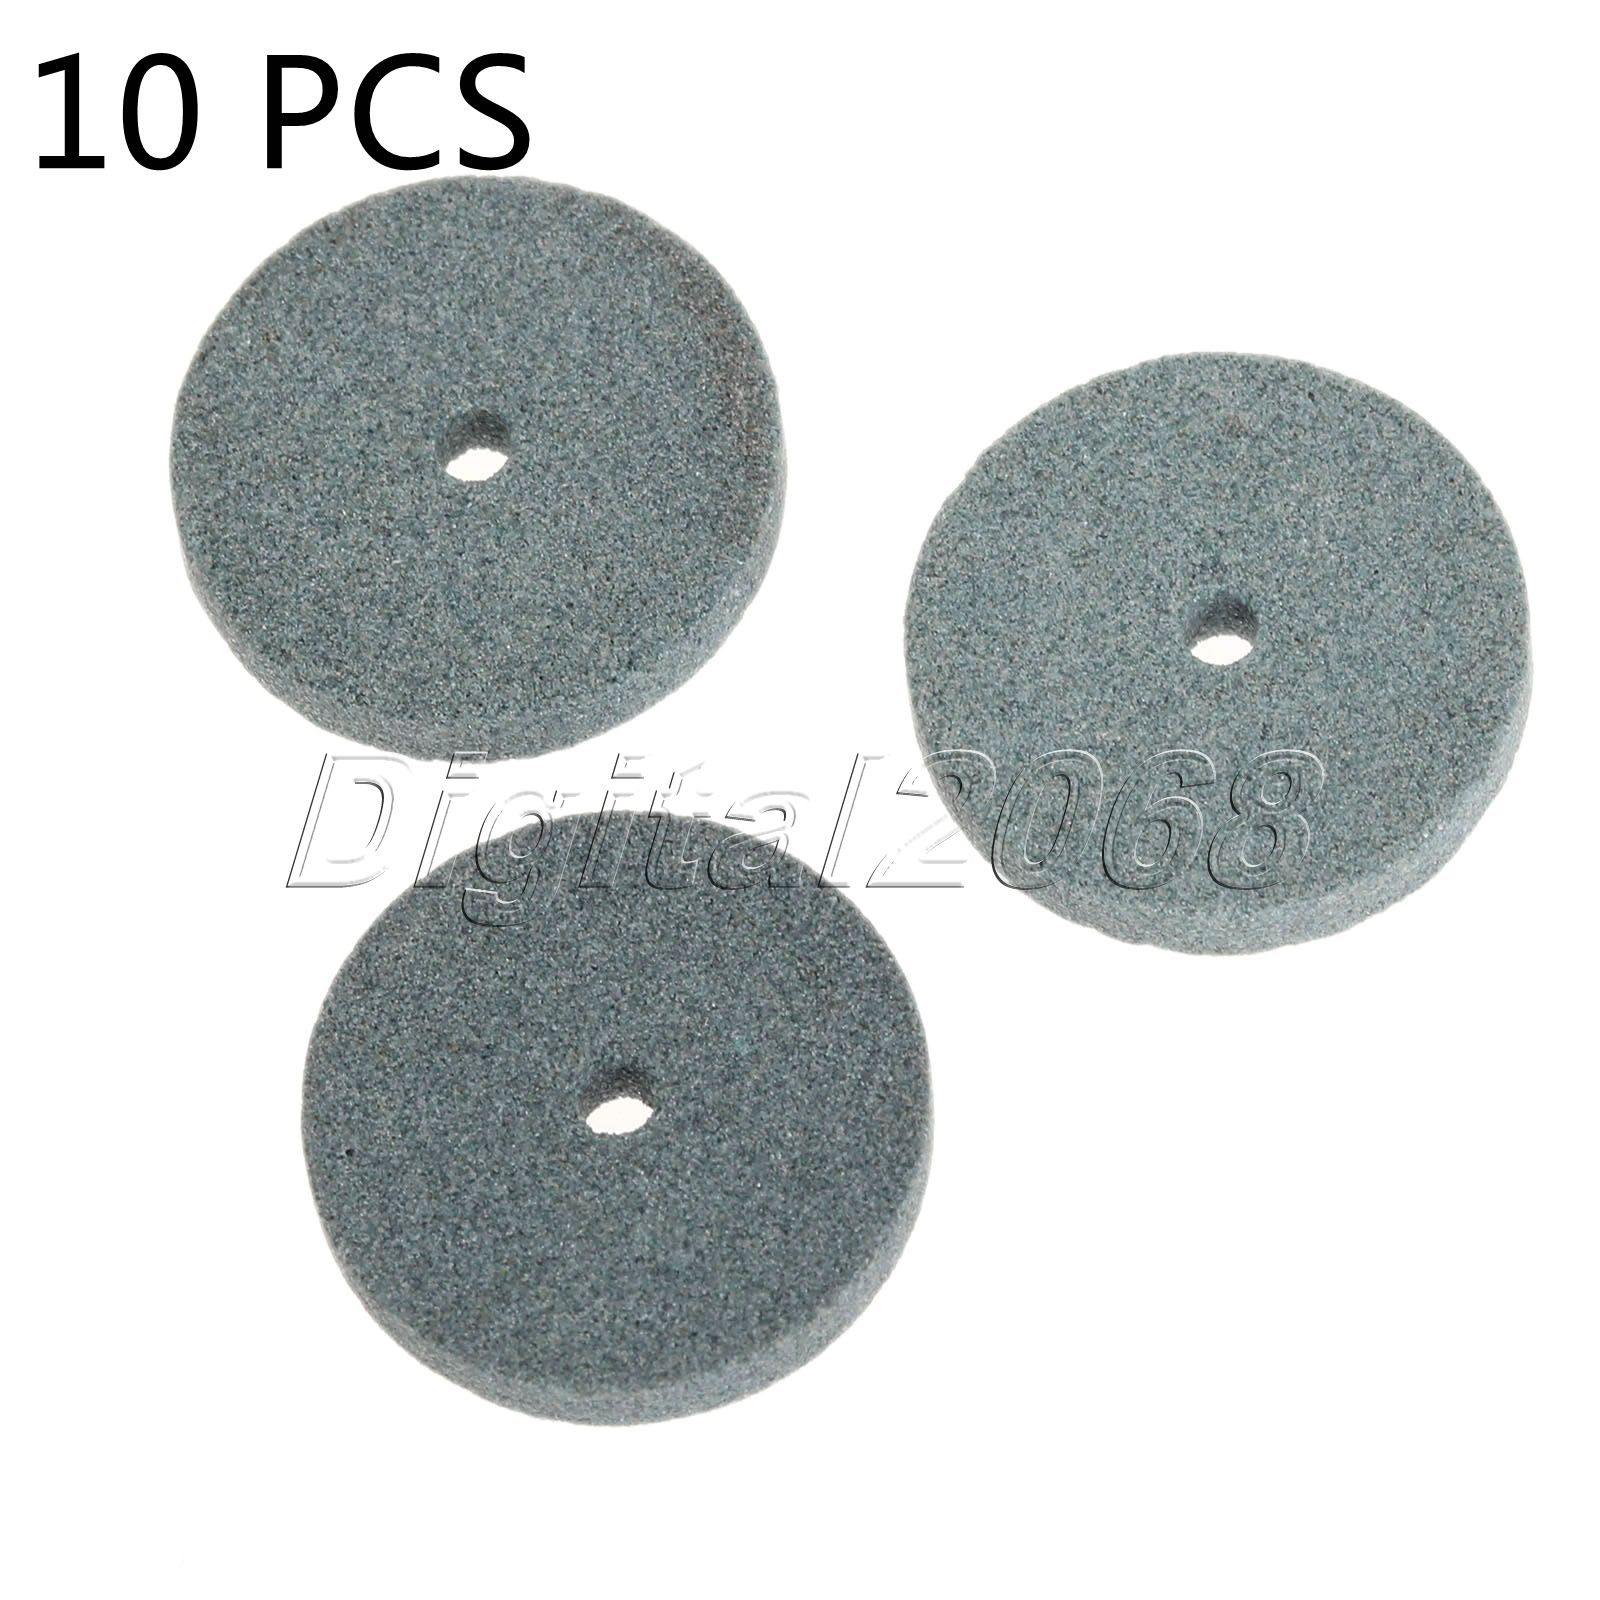 10pcs Mini Green Grinding Wheel Polishing Mounted Stone